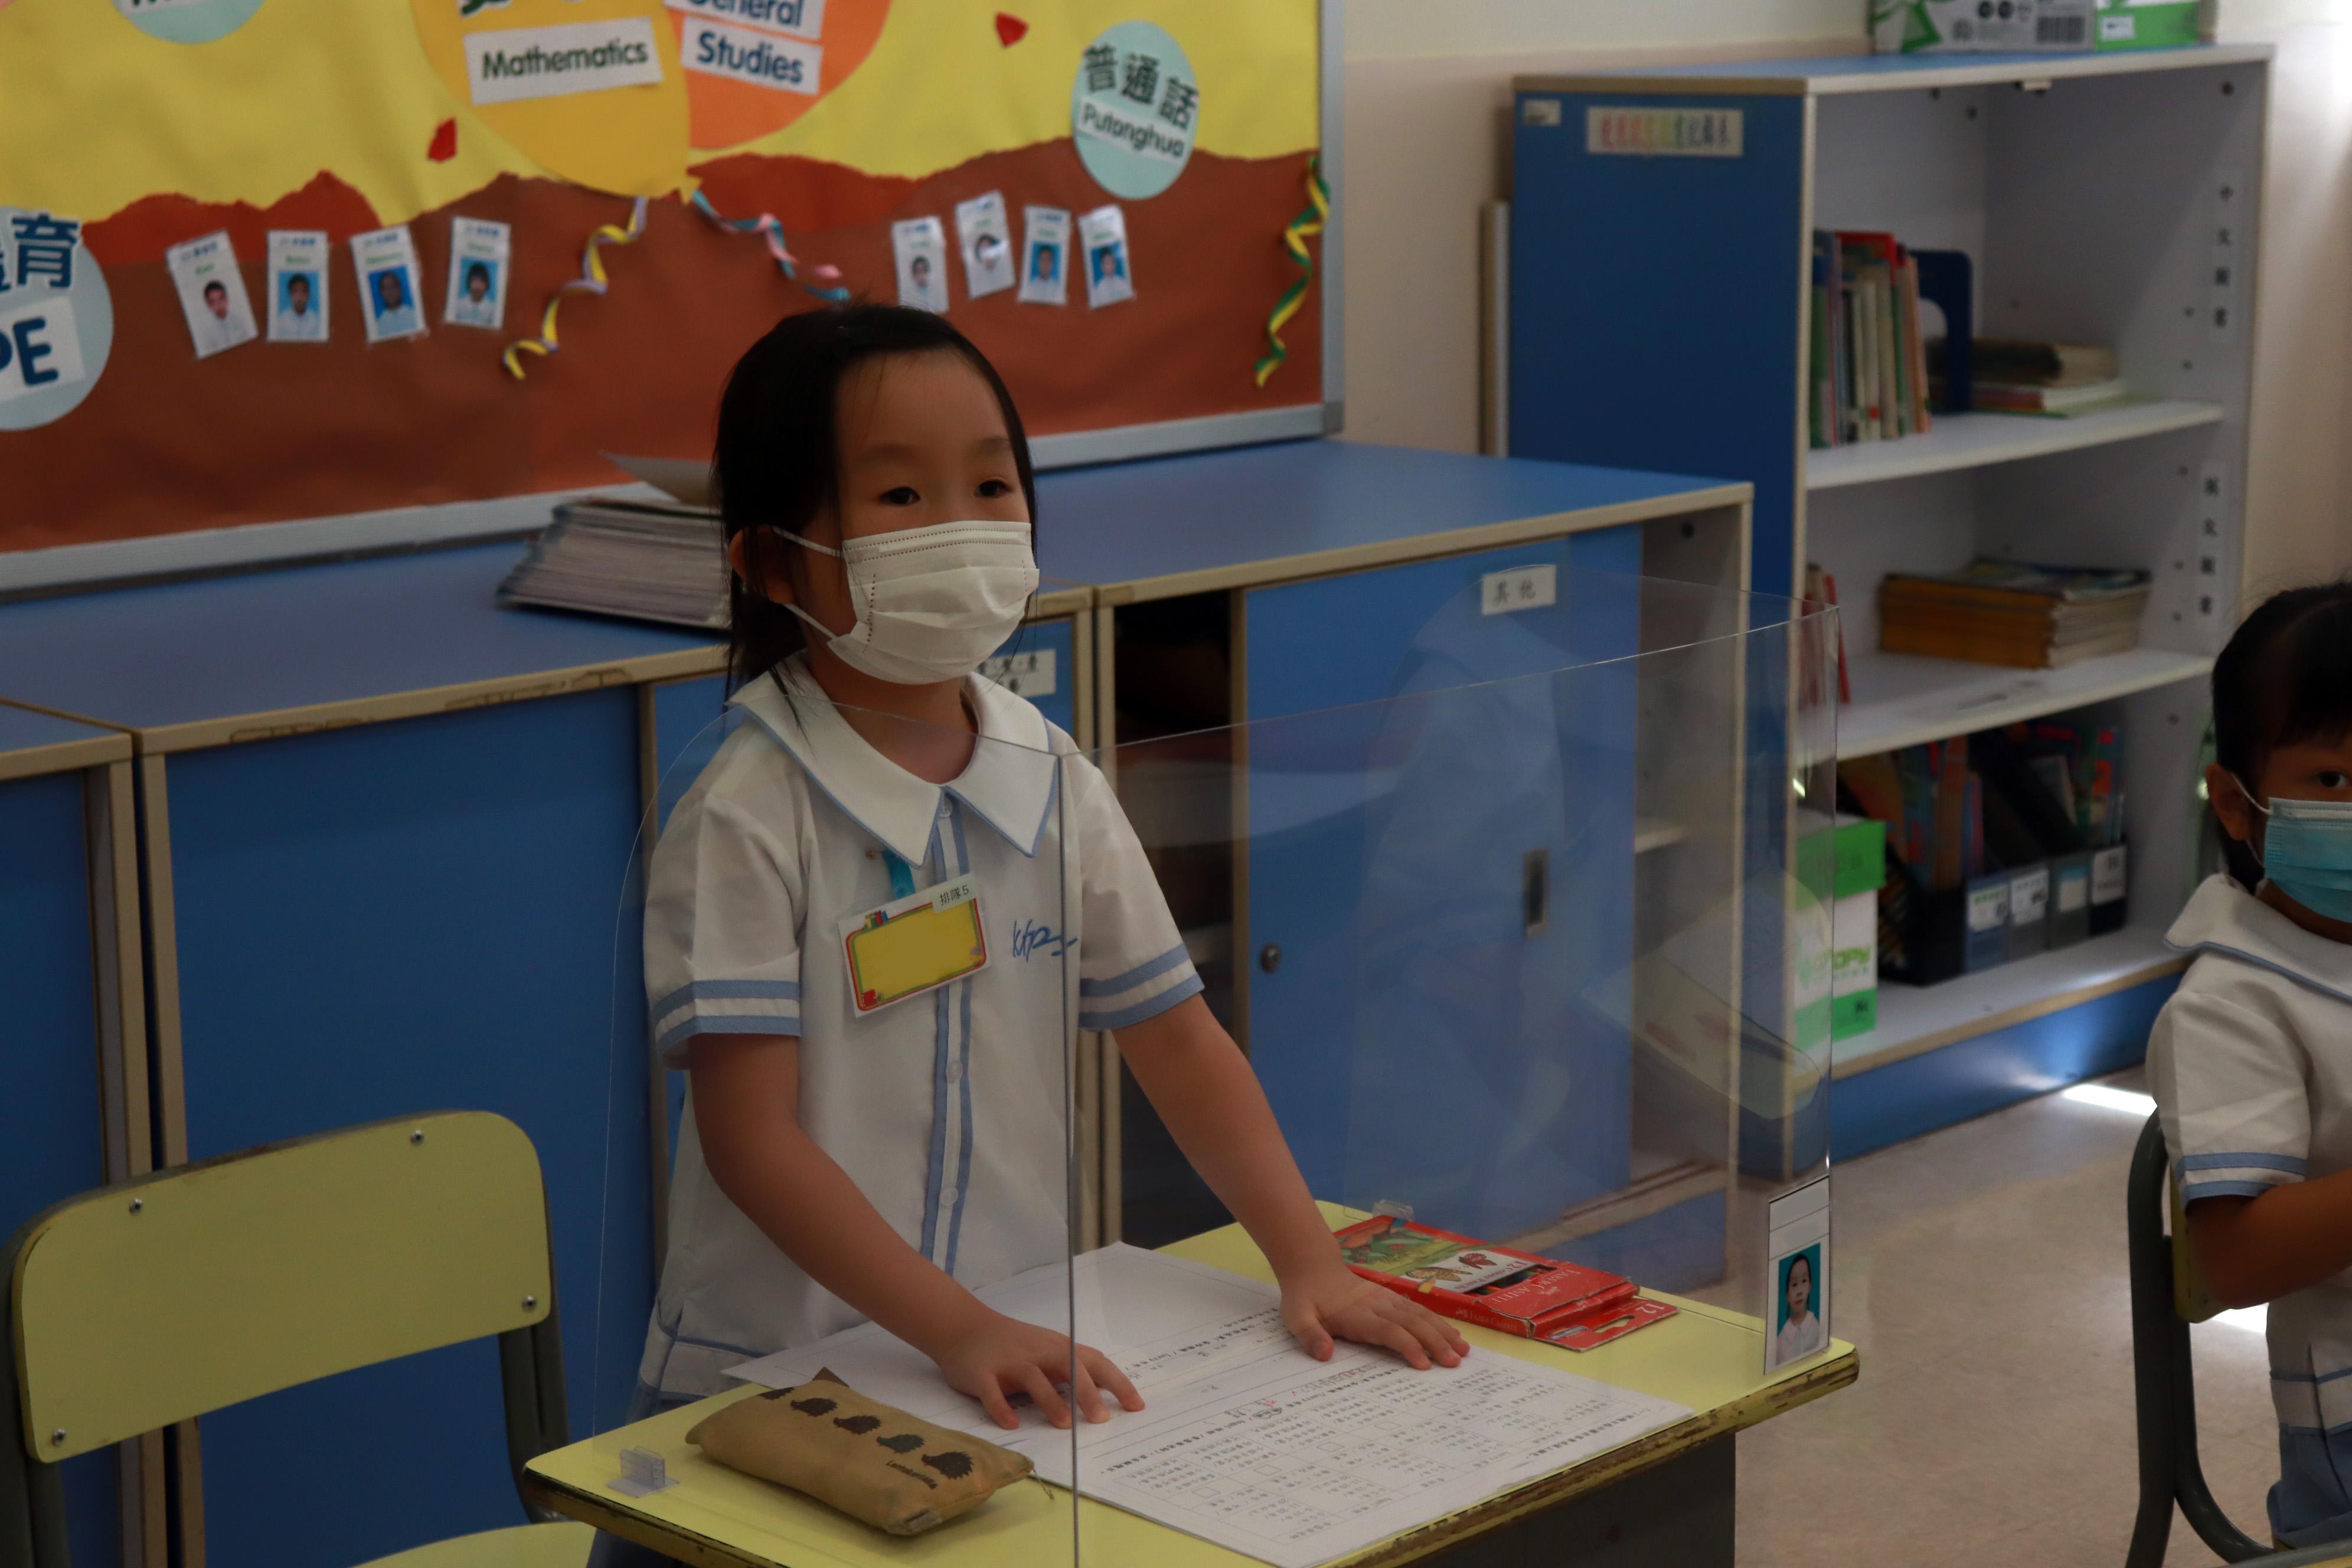 http://keito.school.hk/sites/default/files/img_6555.jpg